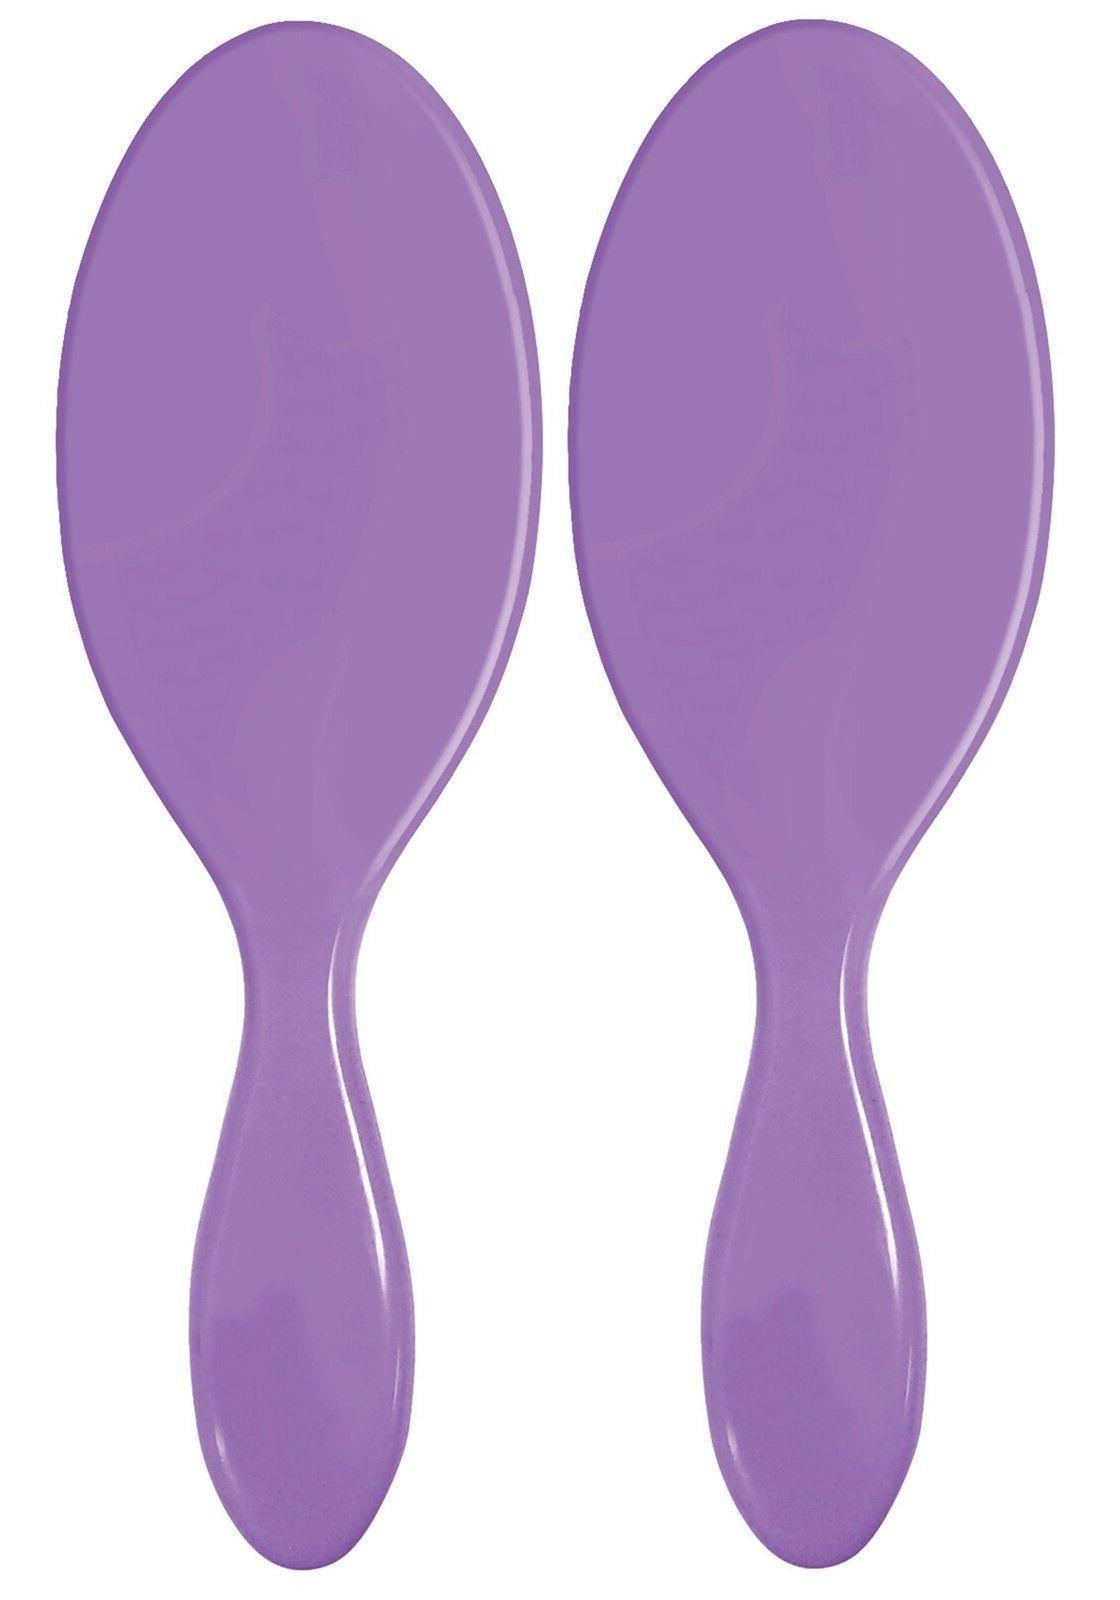 2 Premium Detangling Original Comb Brush Anti Purple NEW